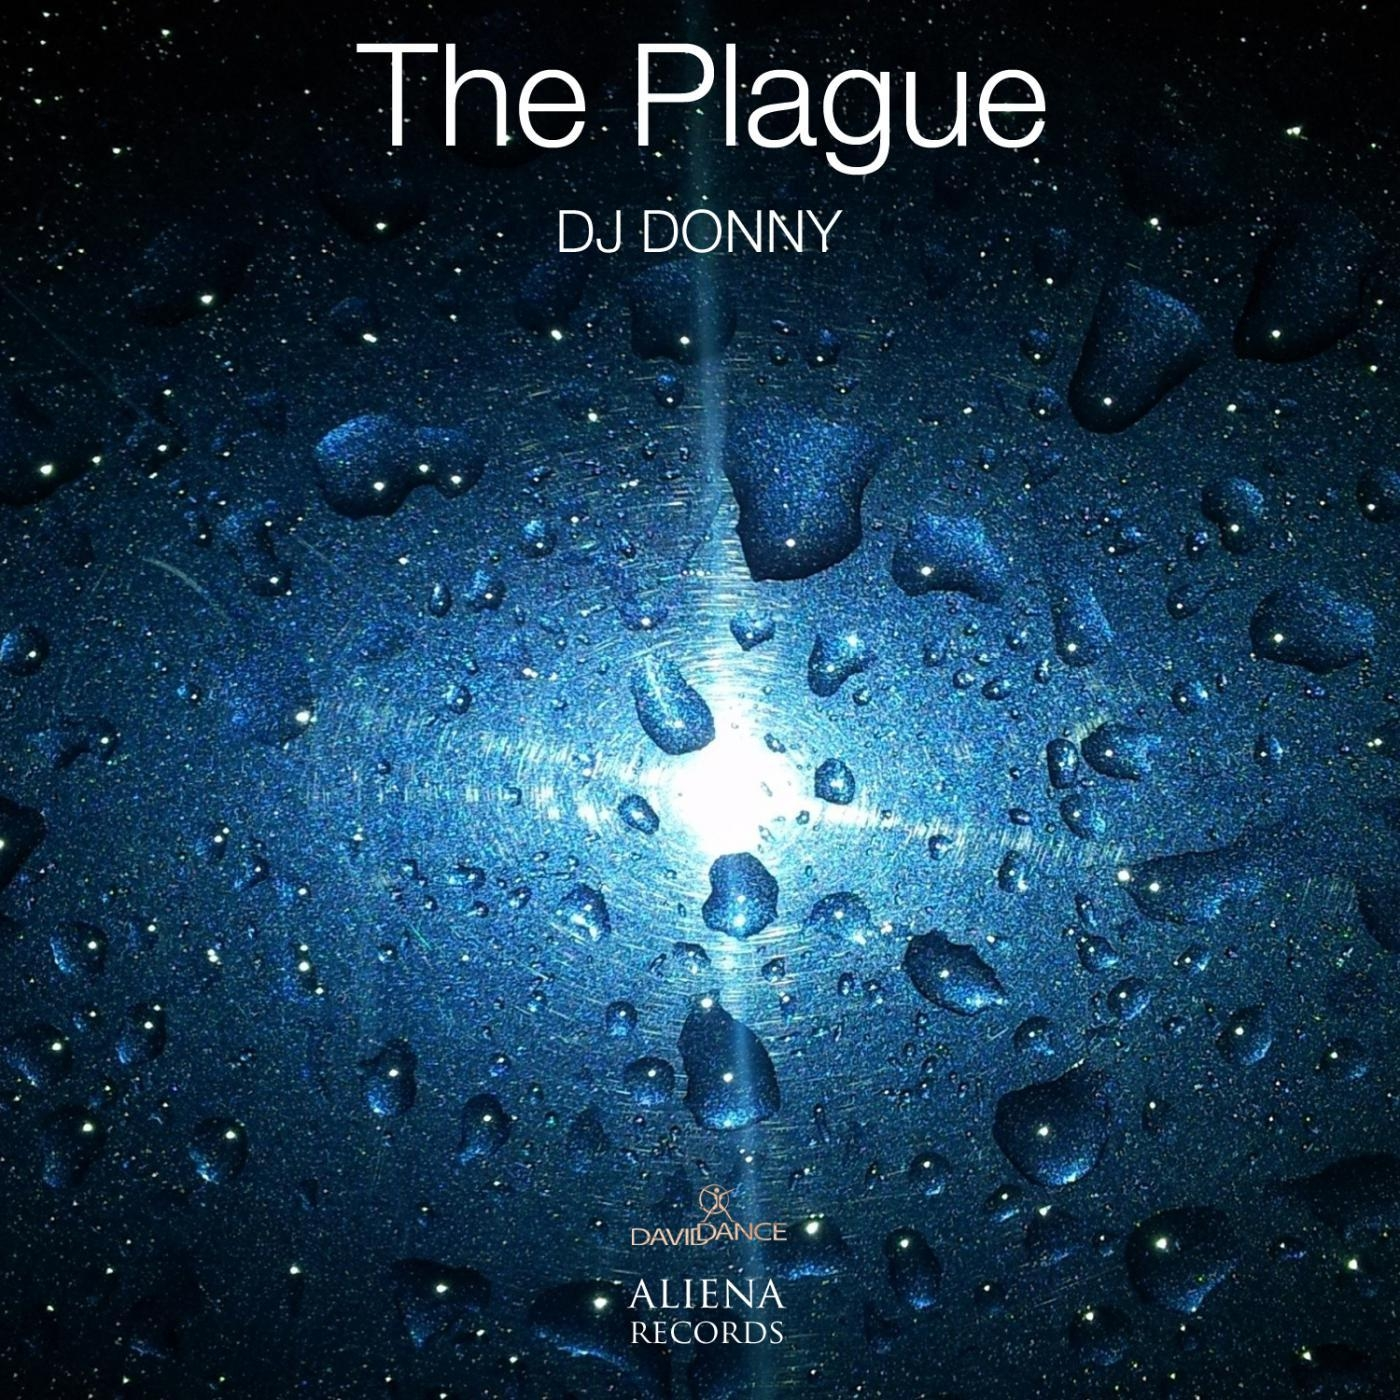 DJ Donny - The Plague (Original mix)